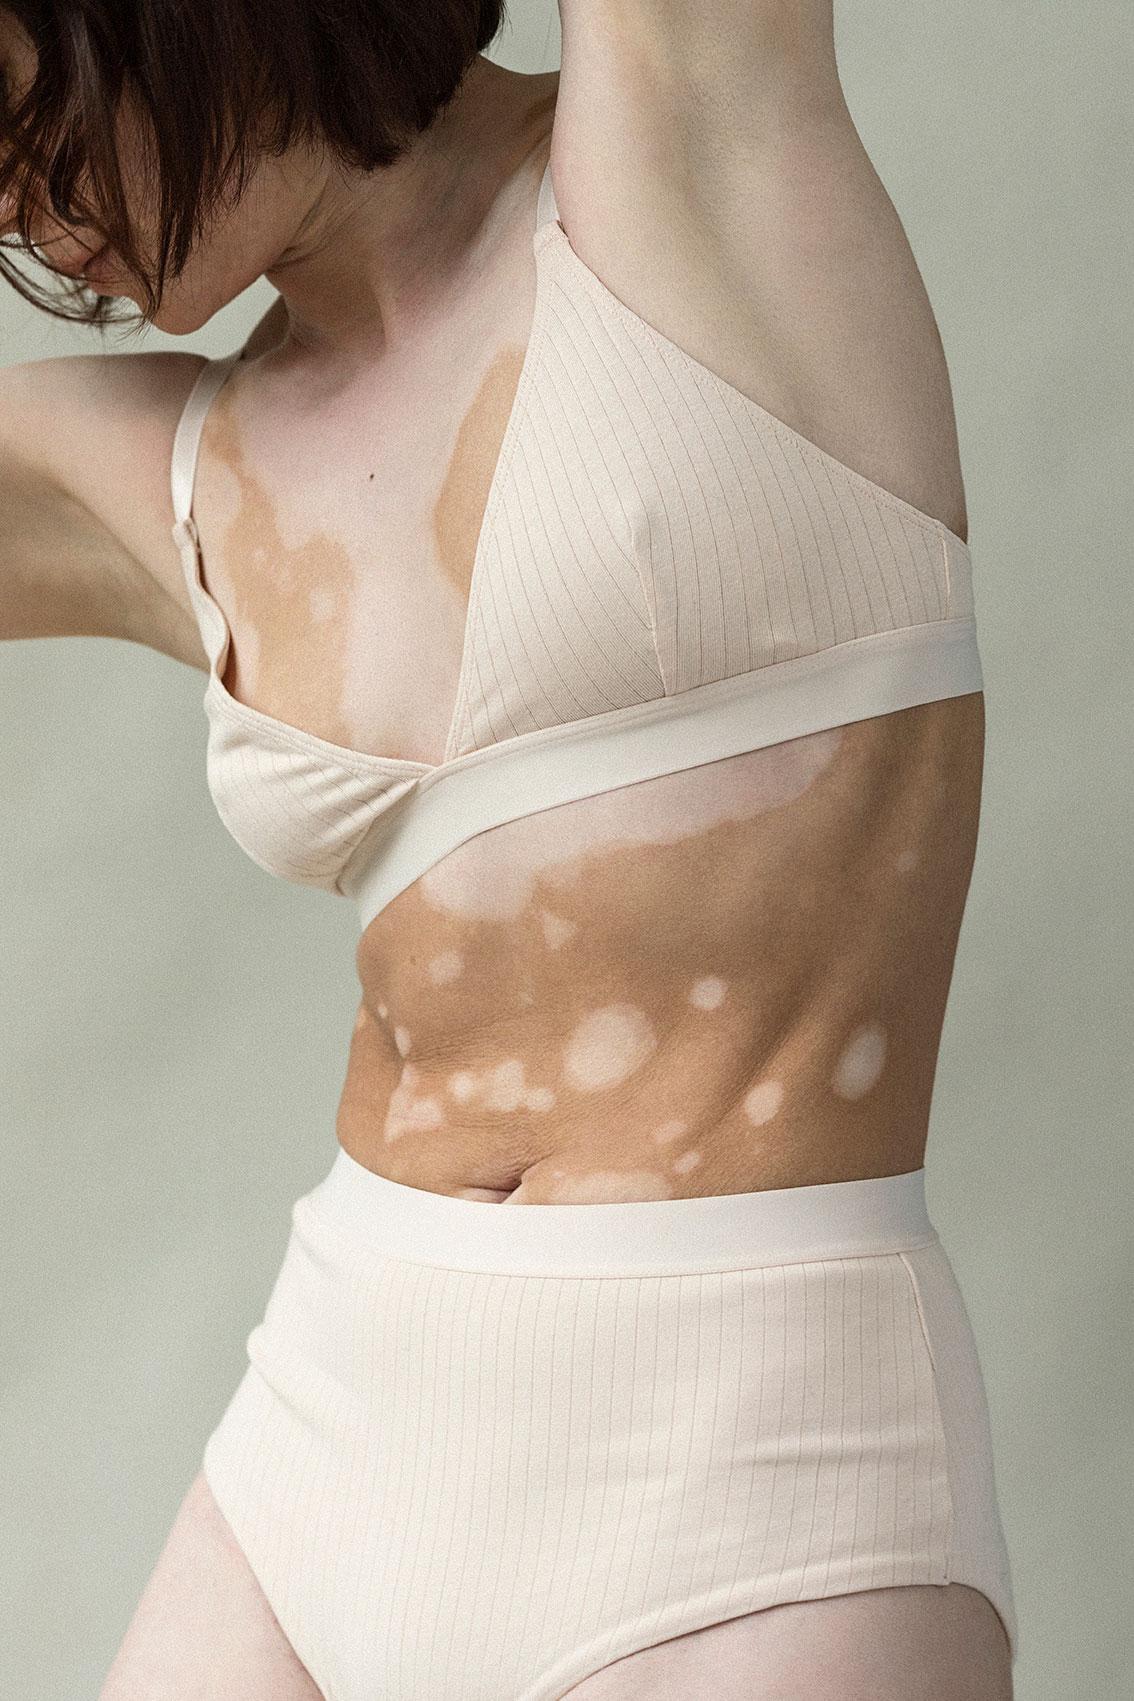 Emilie_Elisabeth-van-Aalderen_vitiligo_3